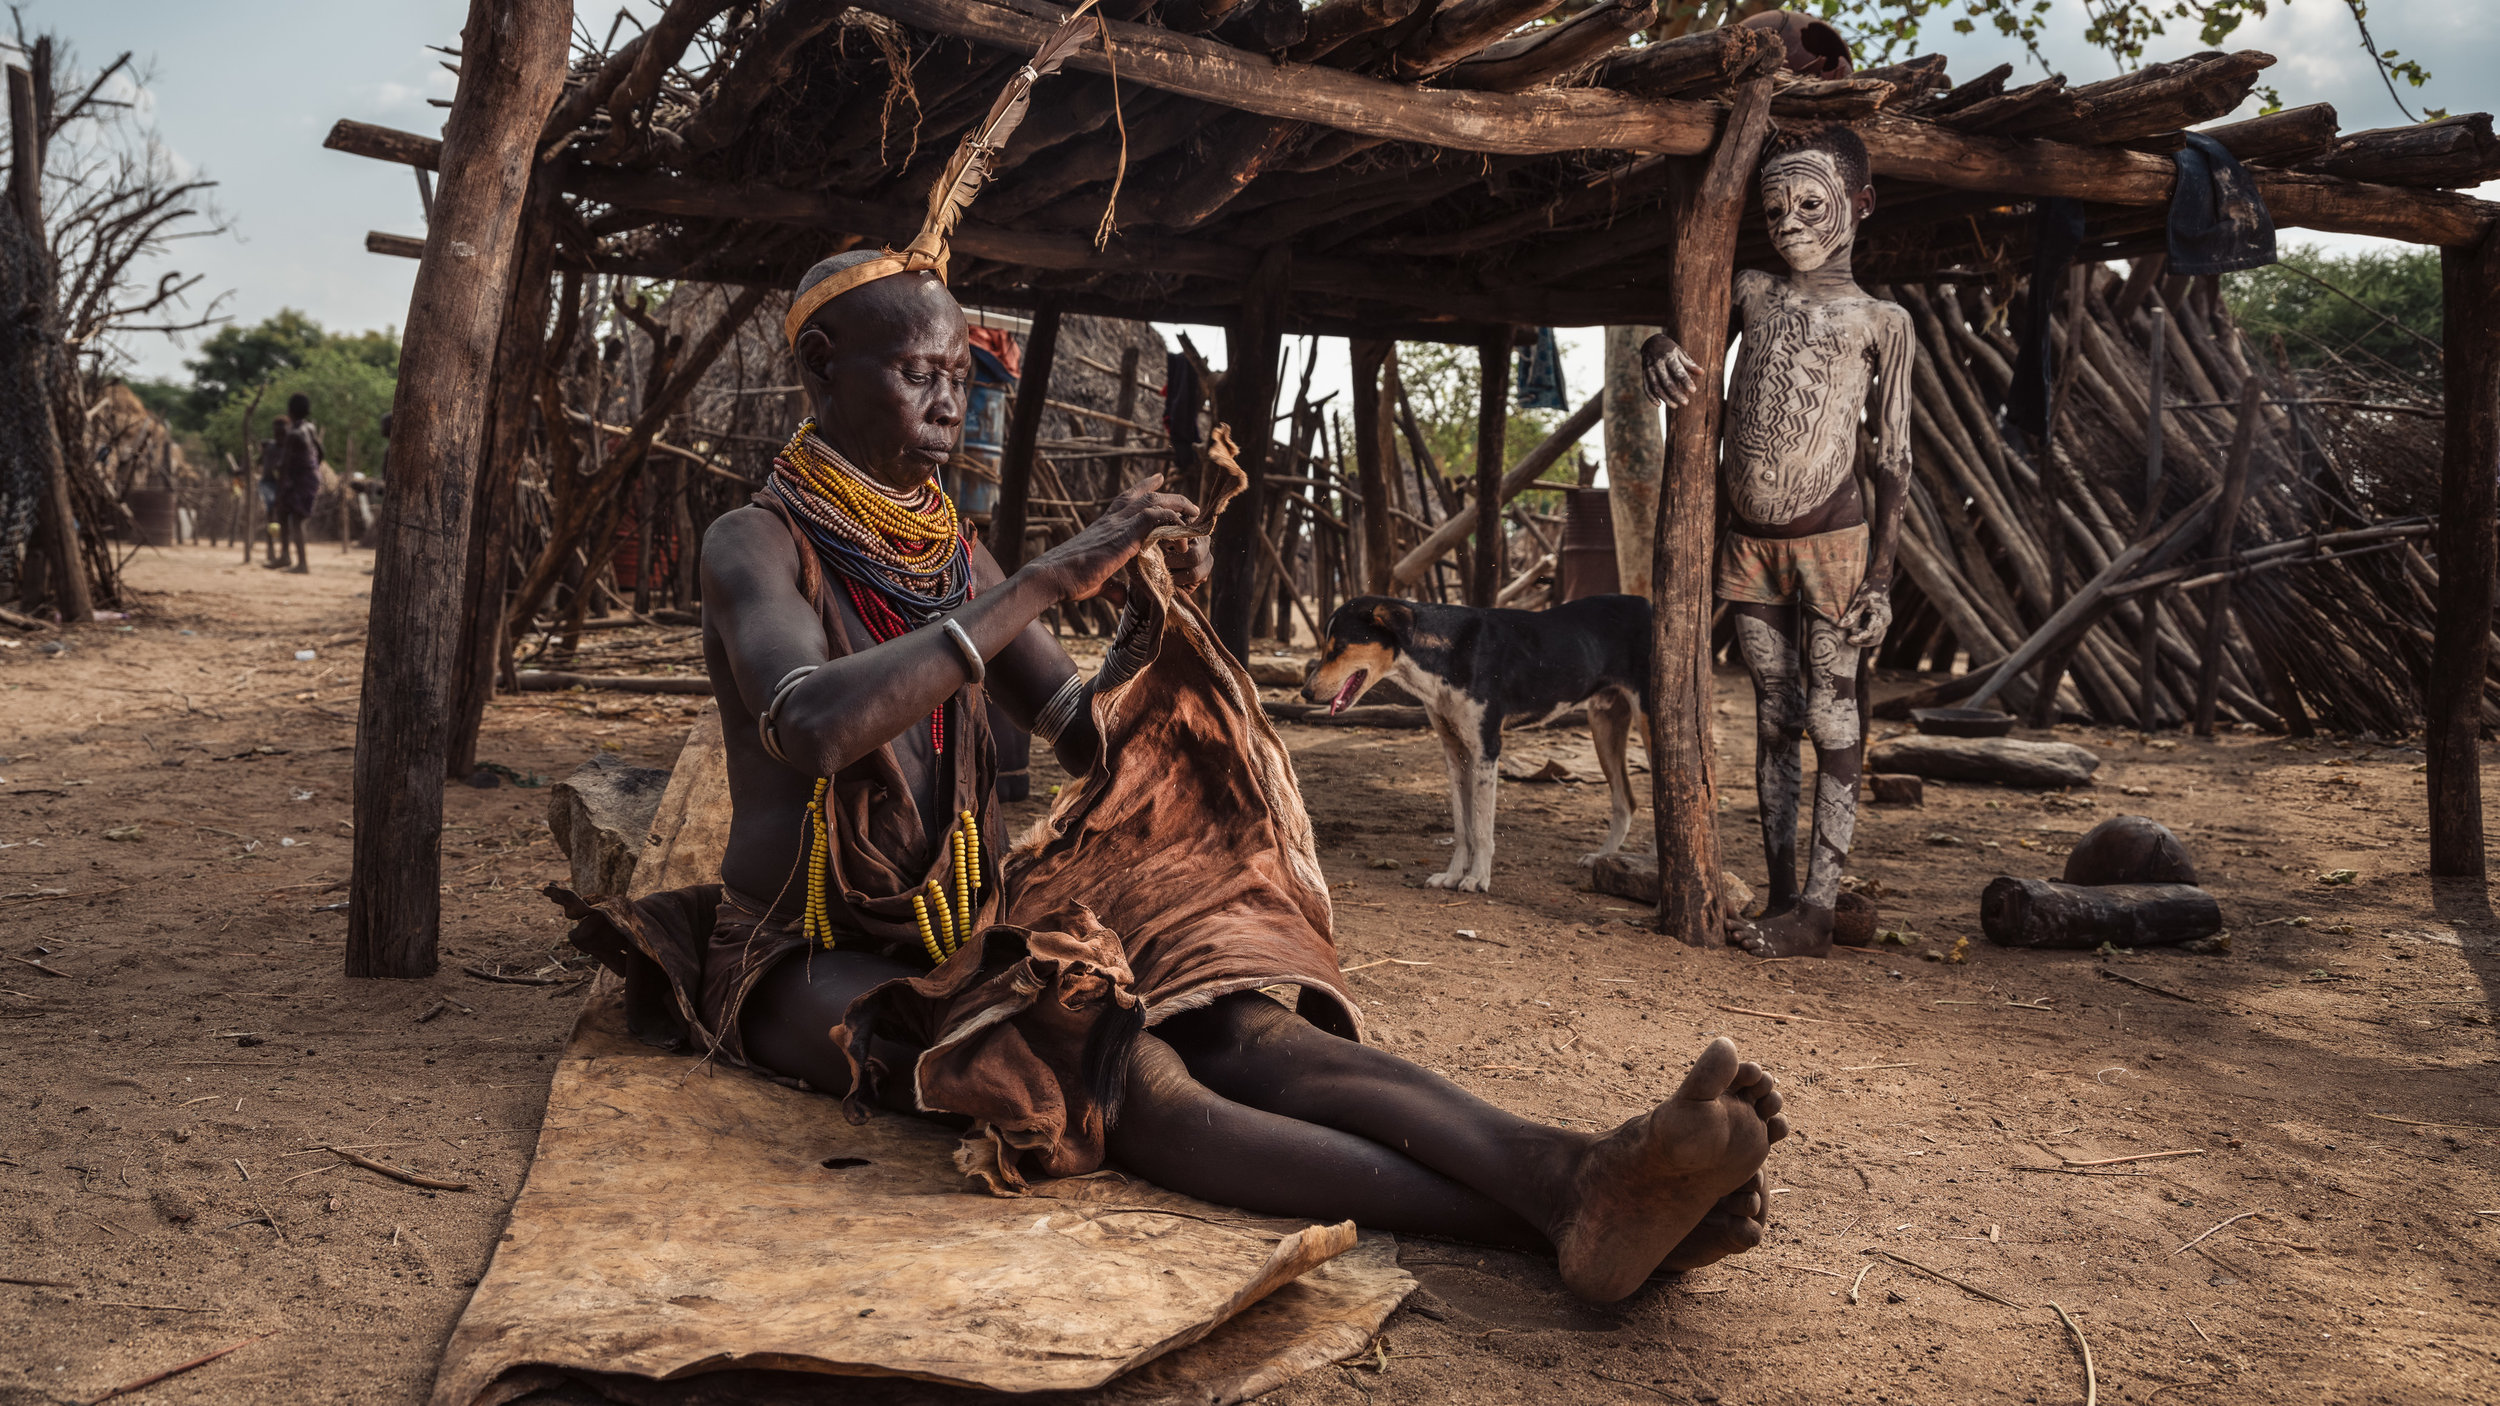 Ethiopia-Starling-PietVandenEynde_068.jpg